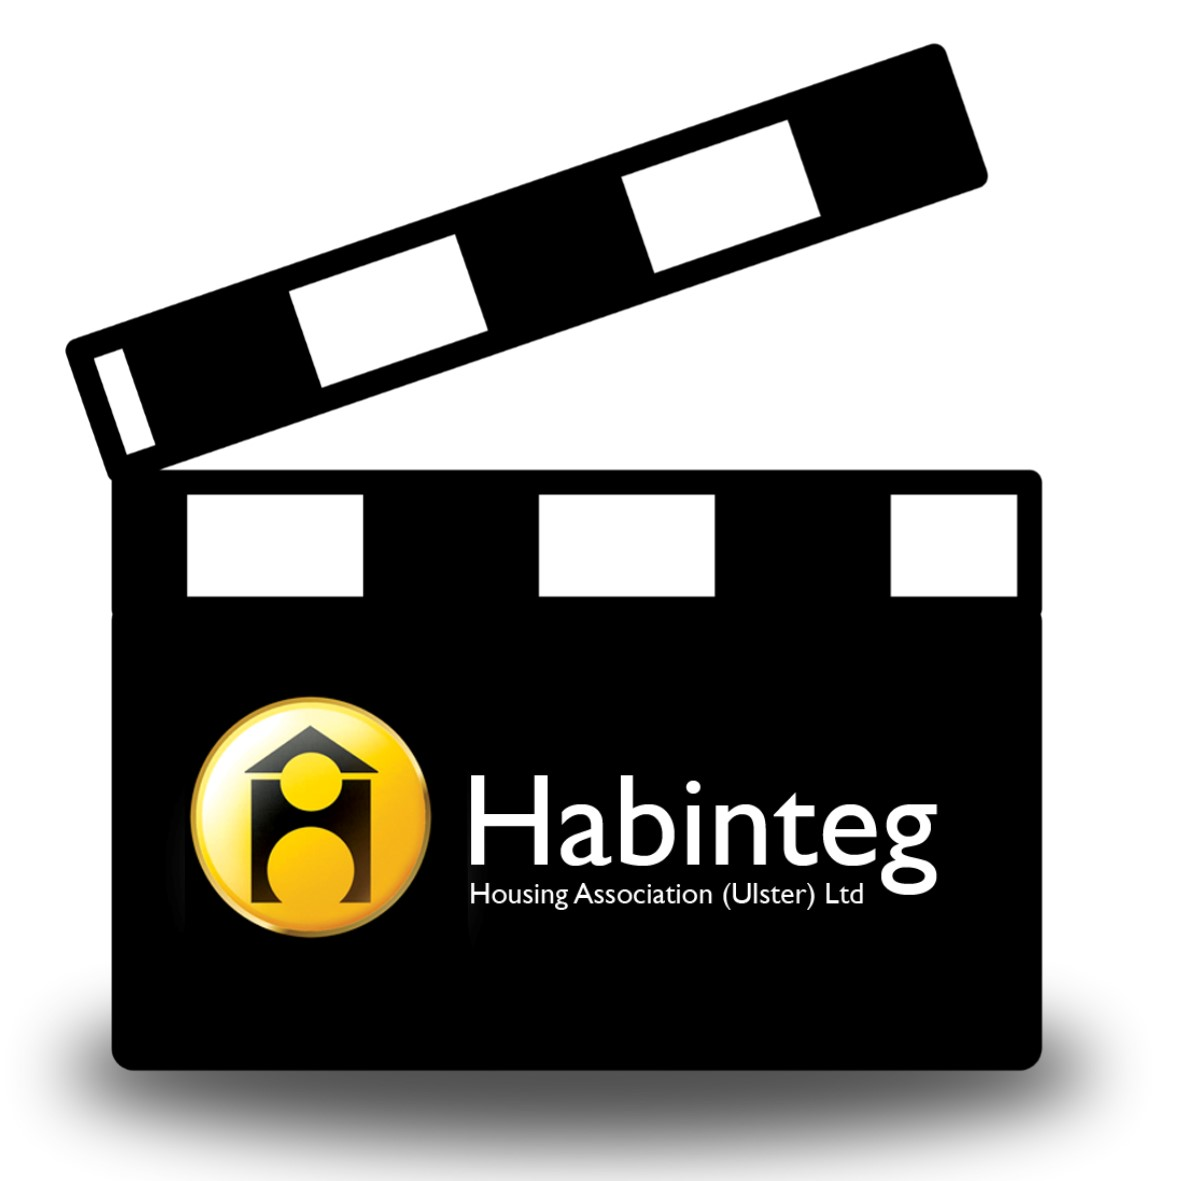 Habinteg Homes for All video